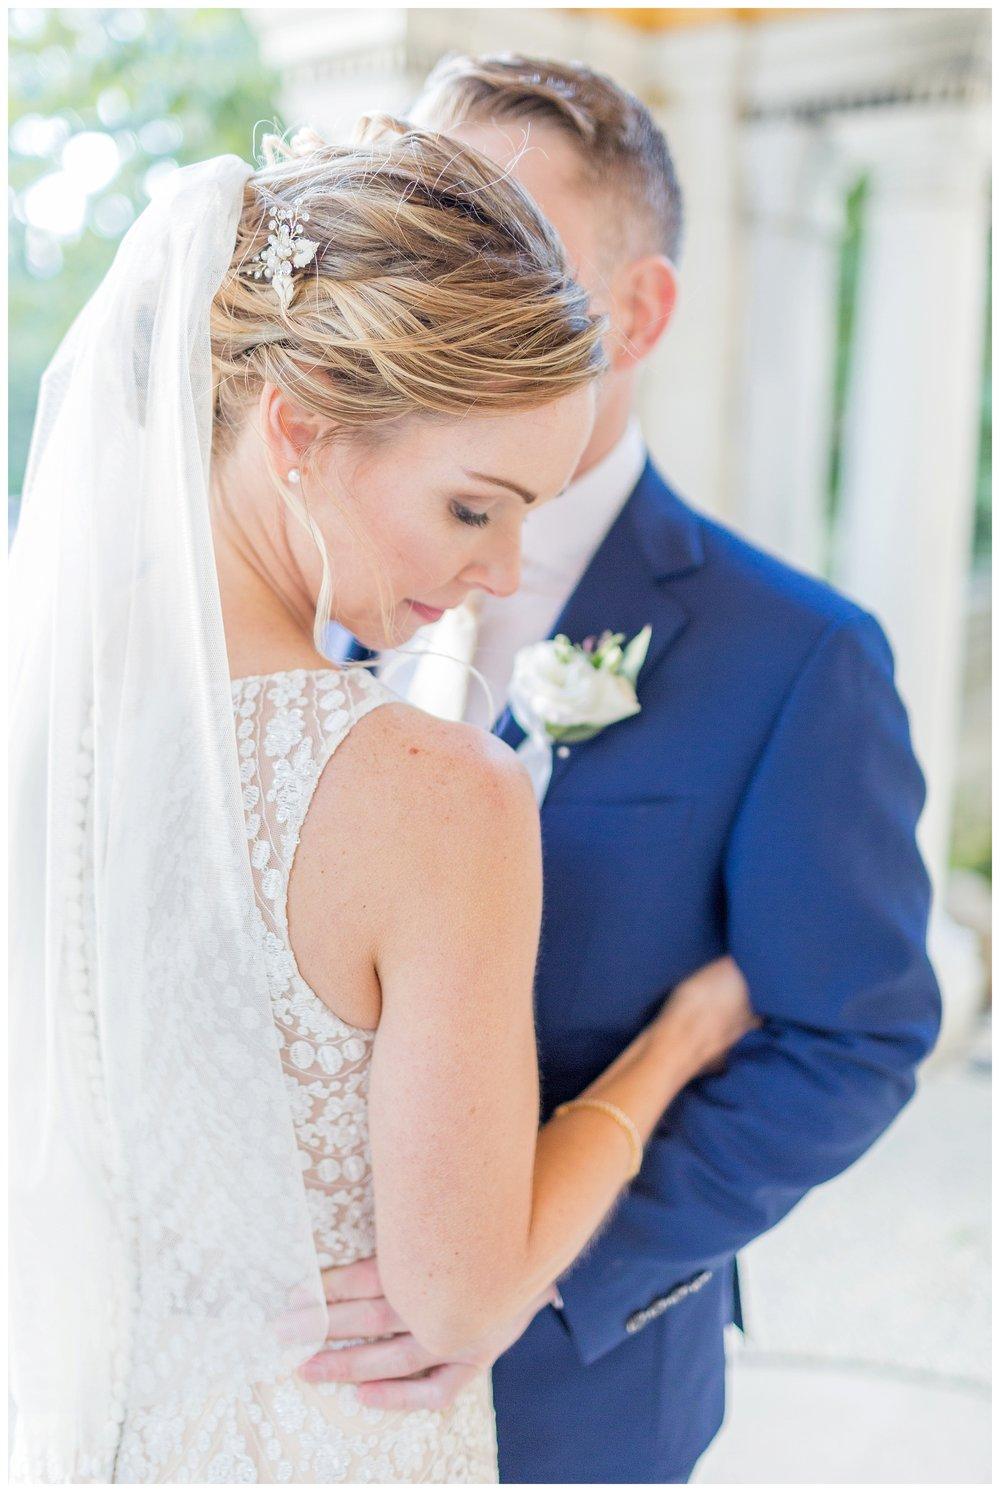 Meridian Hill Park Wedding | Washington DC Wedding Photographer Kir Tuben_0078.jpg